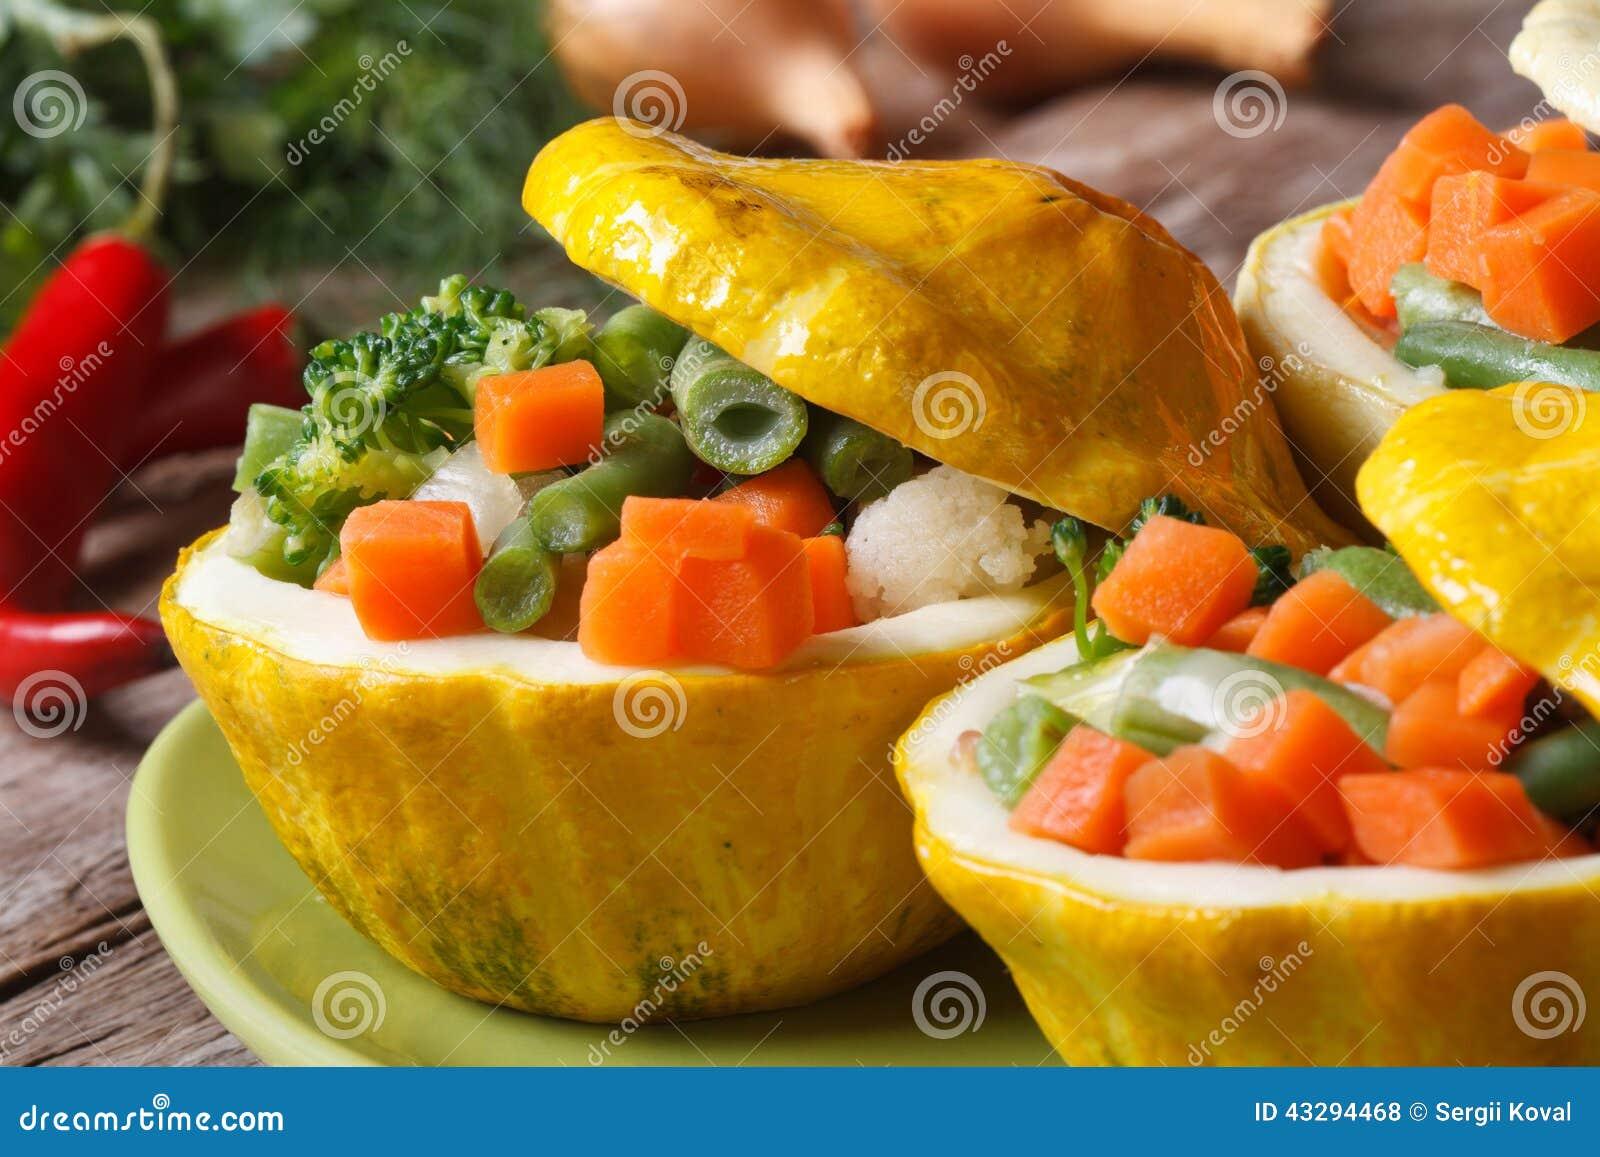 Round Yellow Squash Stuffed With Vegetables Horizontal ...